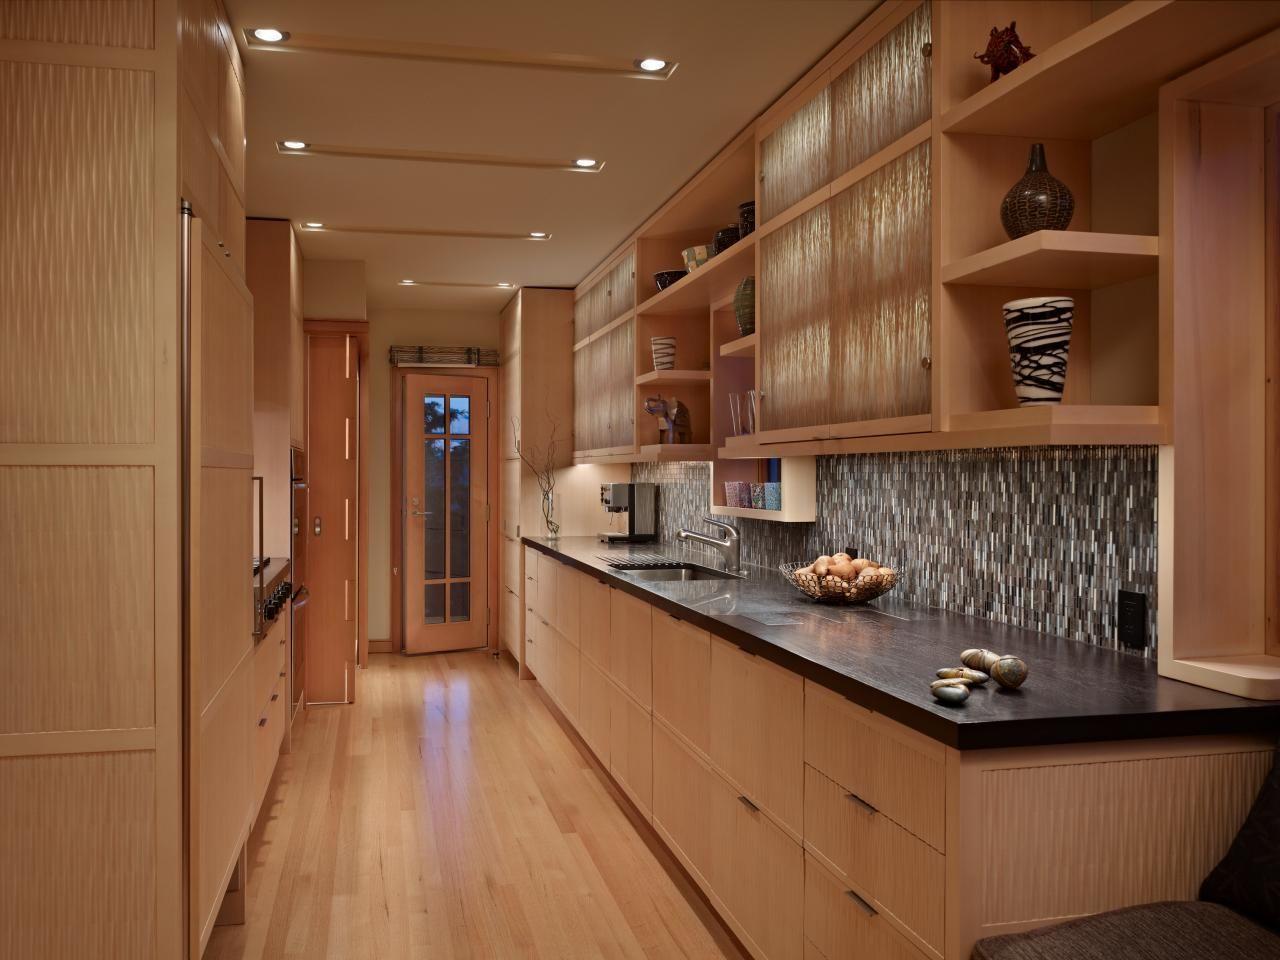 Alaskan Yellow Cedar Cabinets Pair With Limestone And Black Walnut